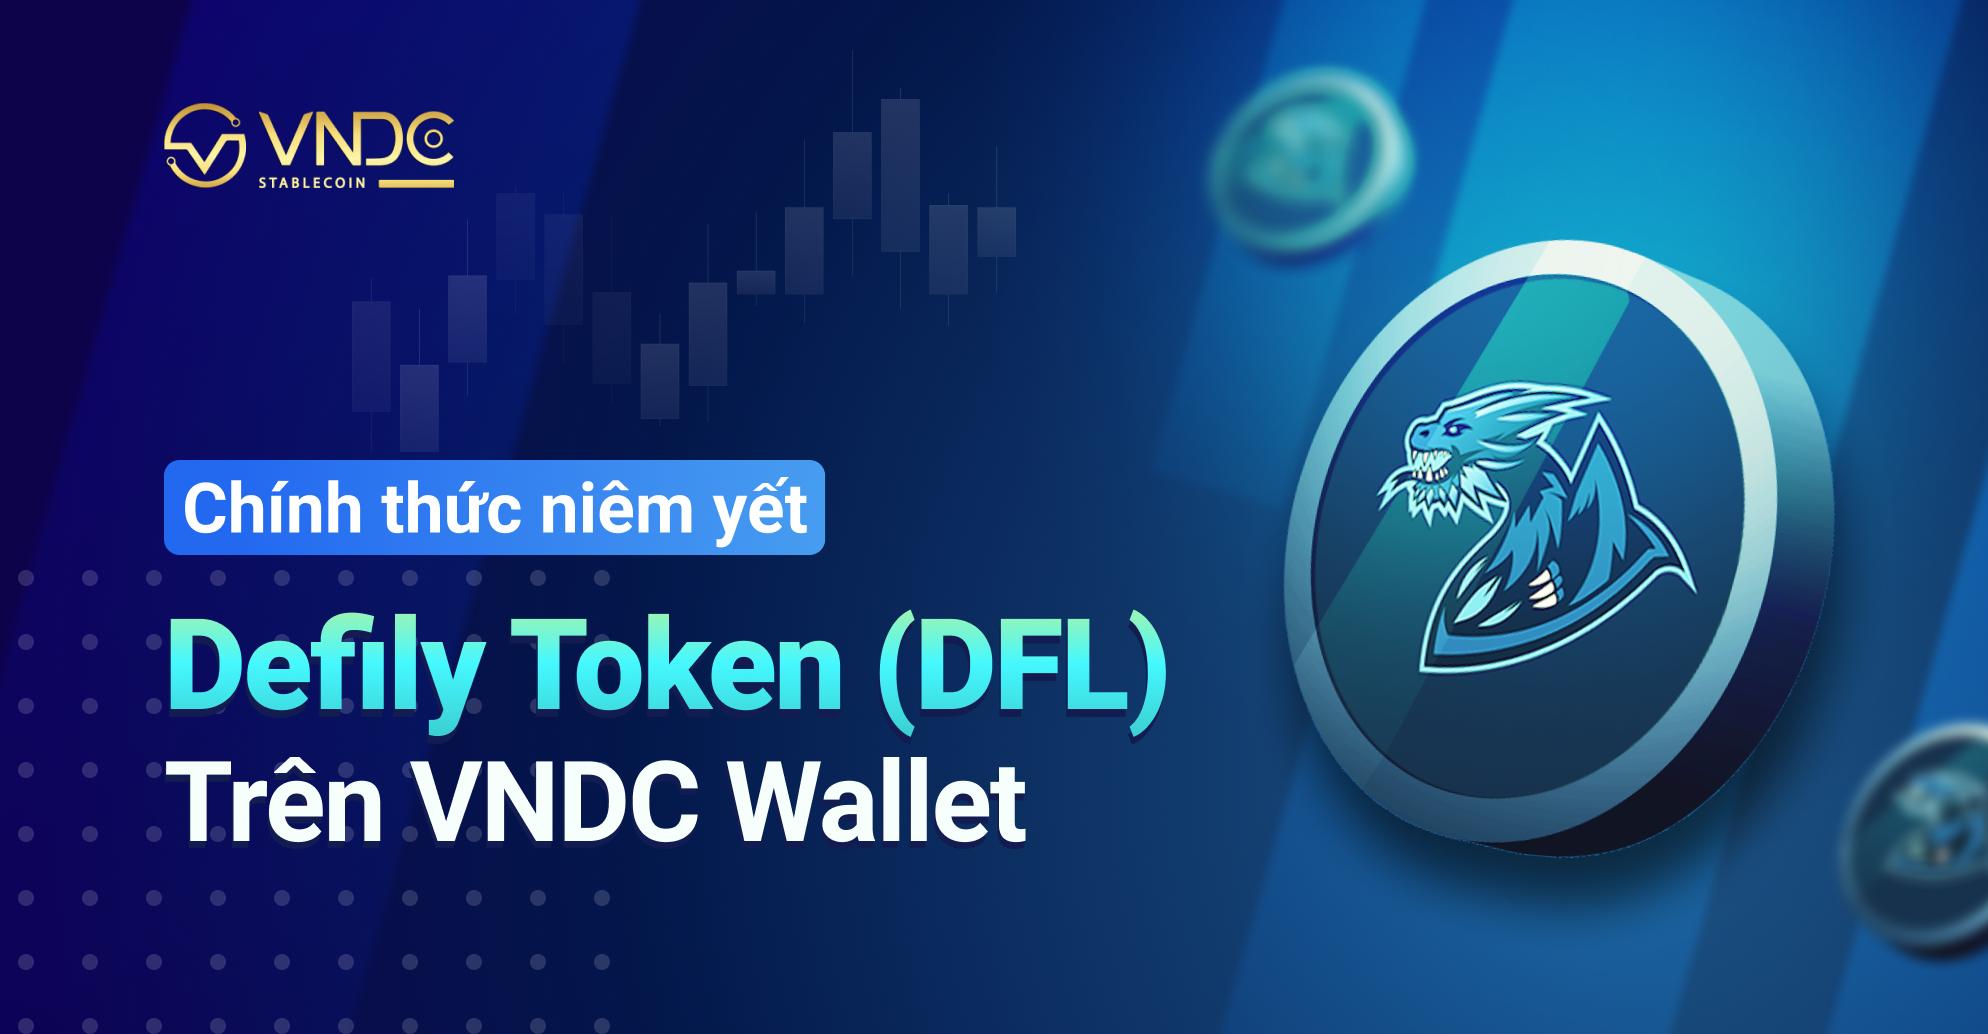 Niêm yết Defily Token (DFL) trên VNDC Wallet